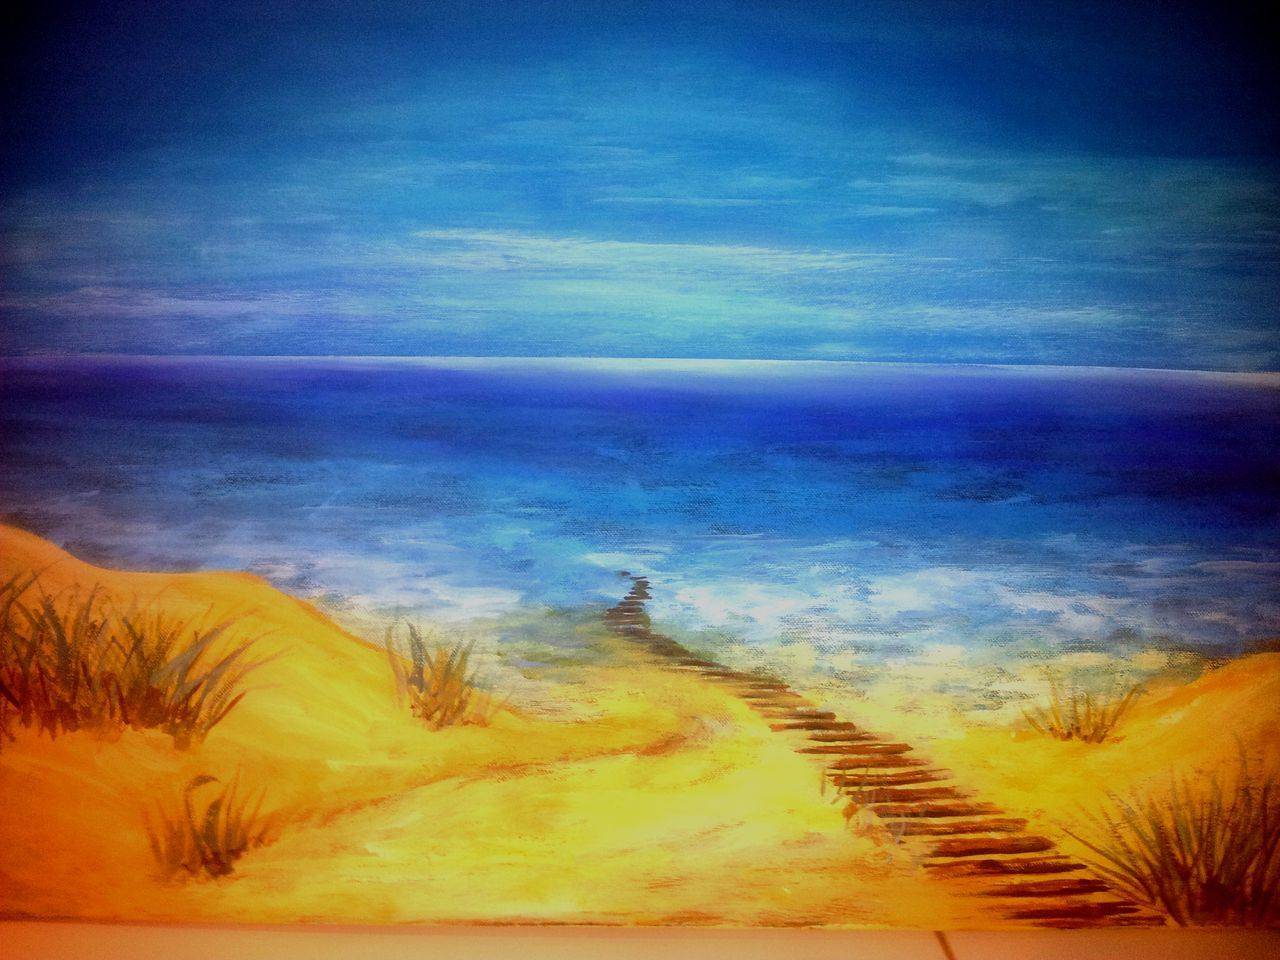 bild acrylmalerei malerei landschaften strandbilder. Black Bedroom Furniture Sets. Home Design Ideas